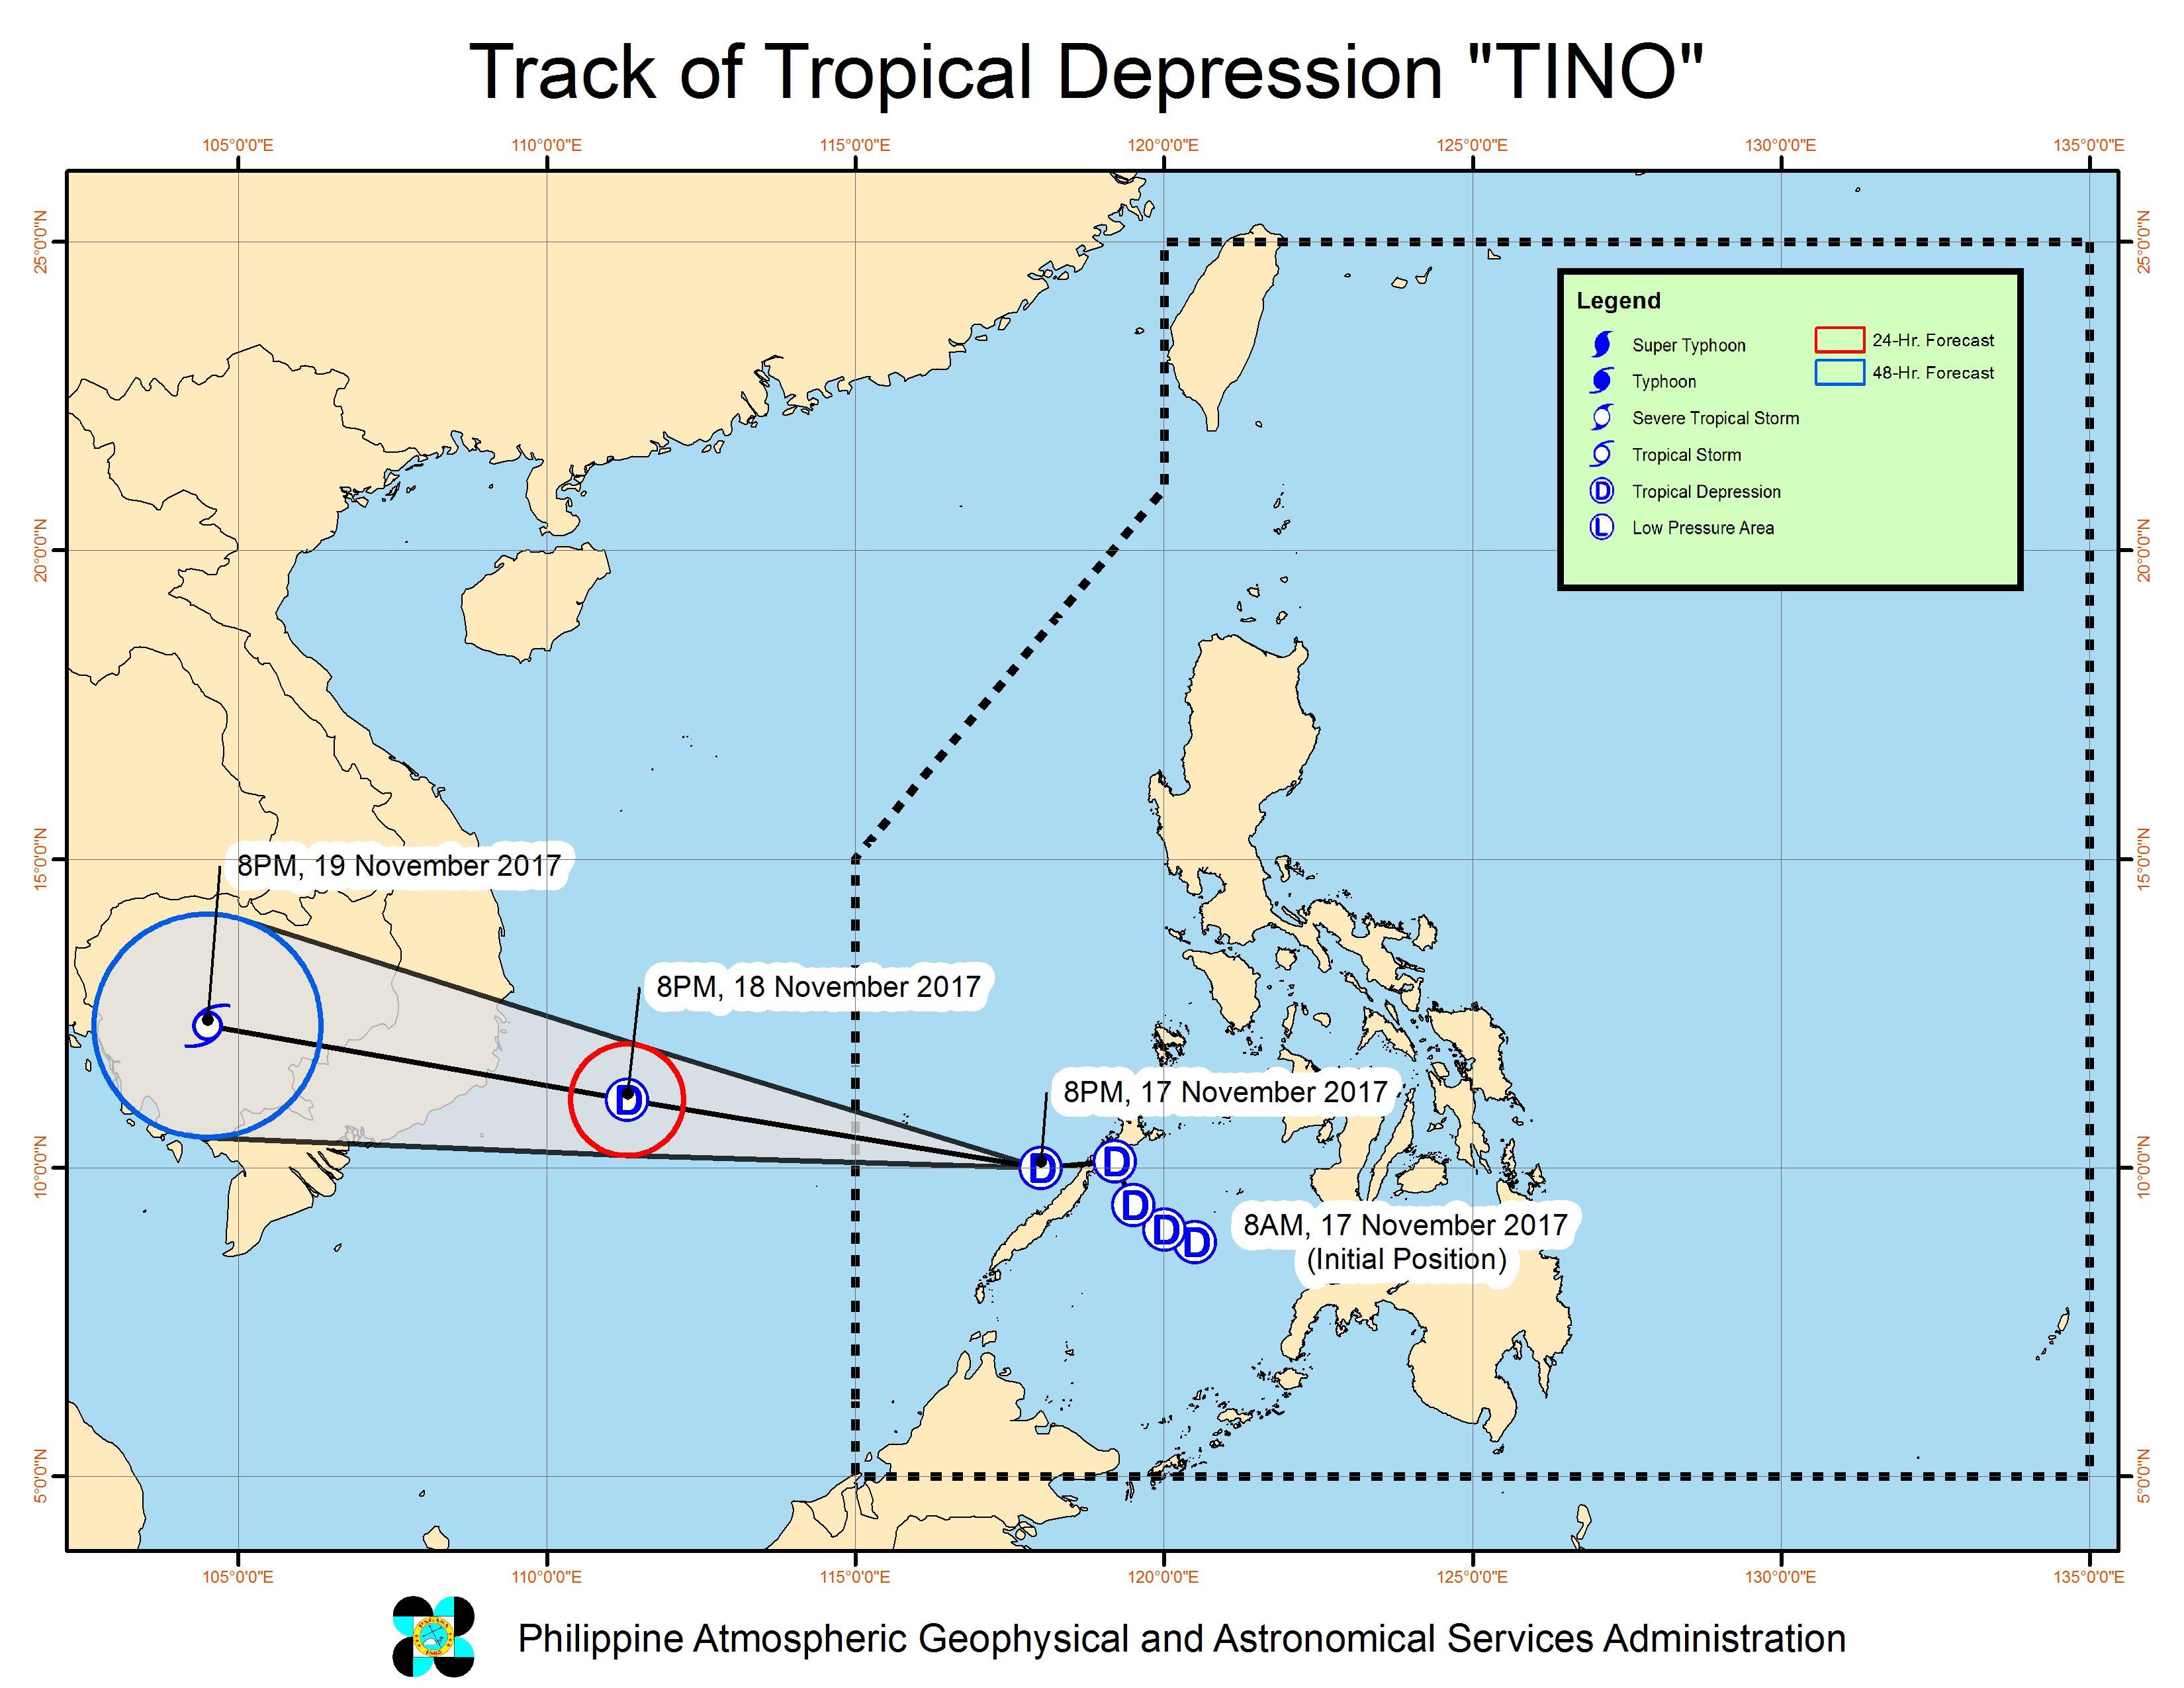 Forecast track of Tropical Depression Tino as of November 17, 11 pm. Image courtesy of PAGASA